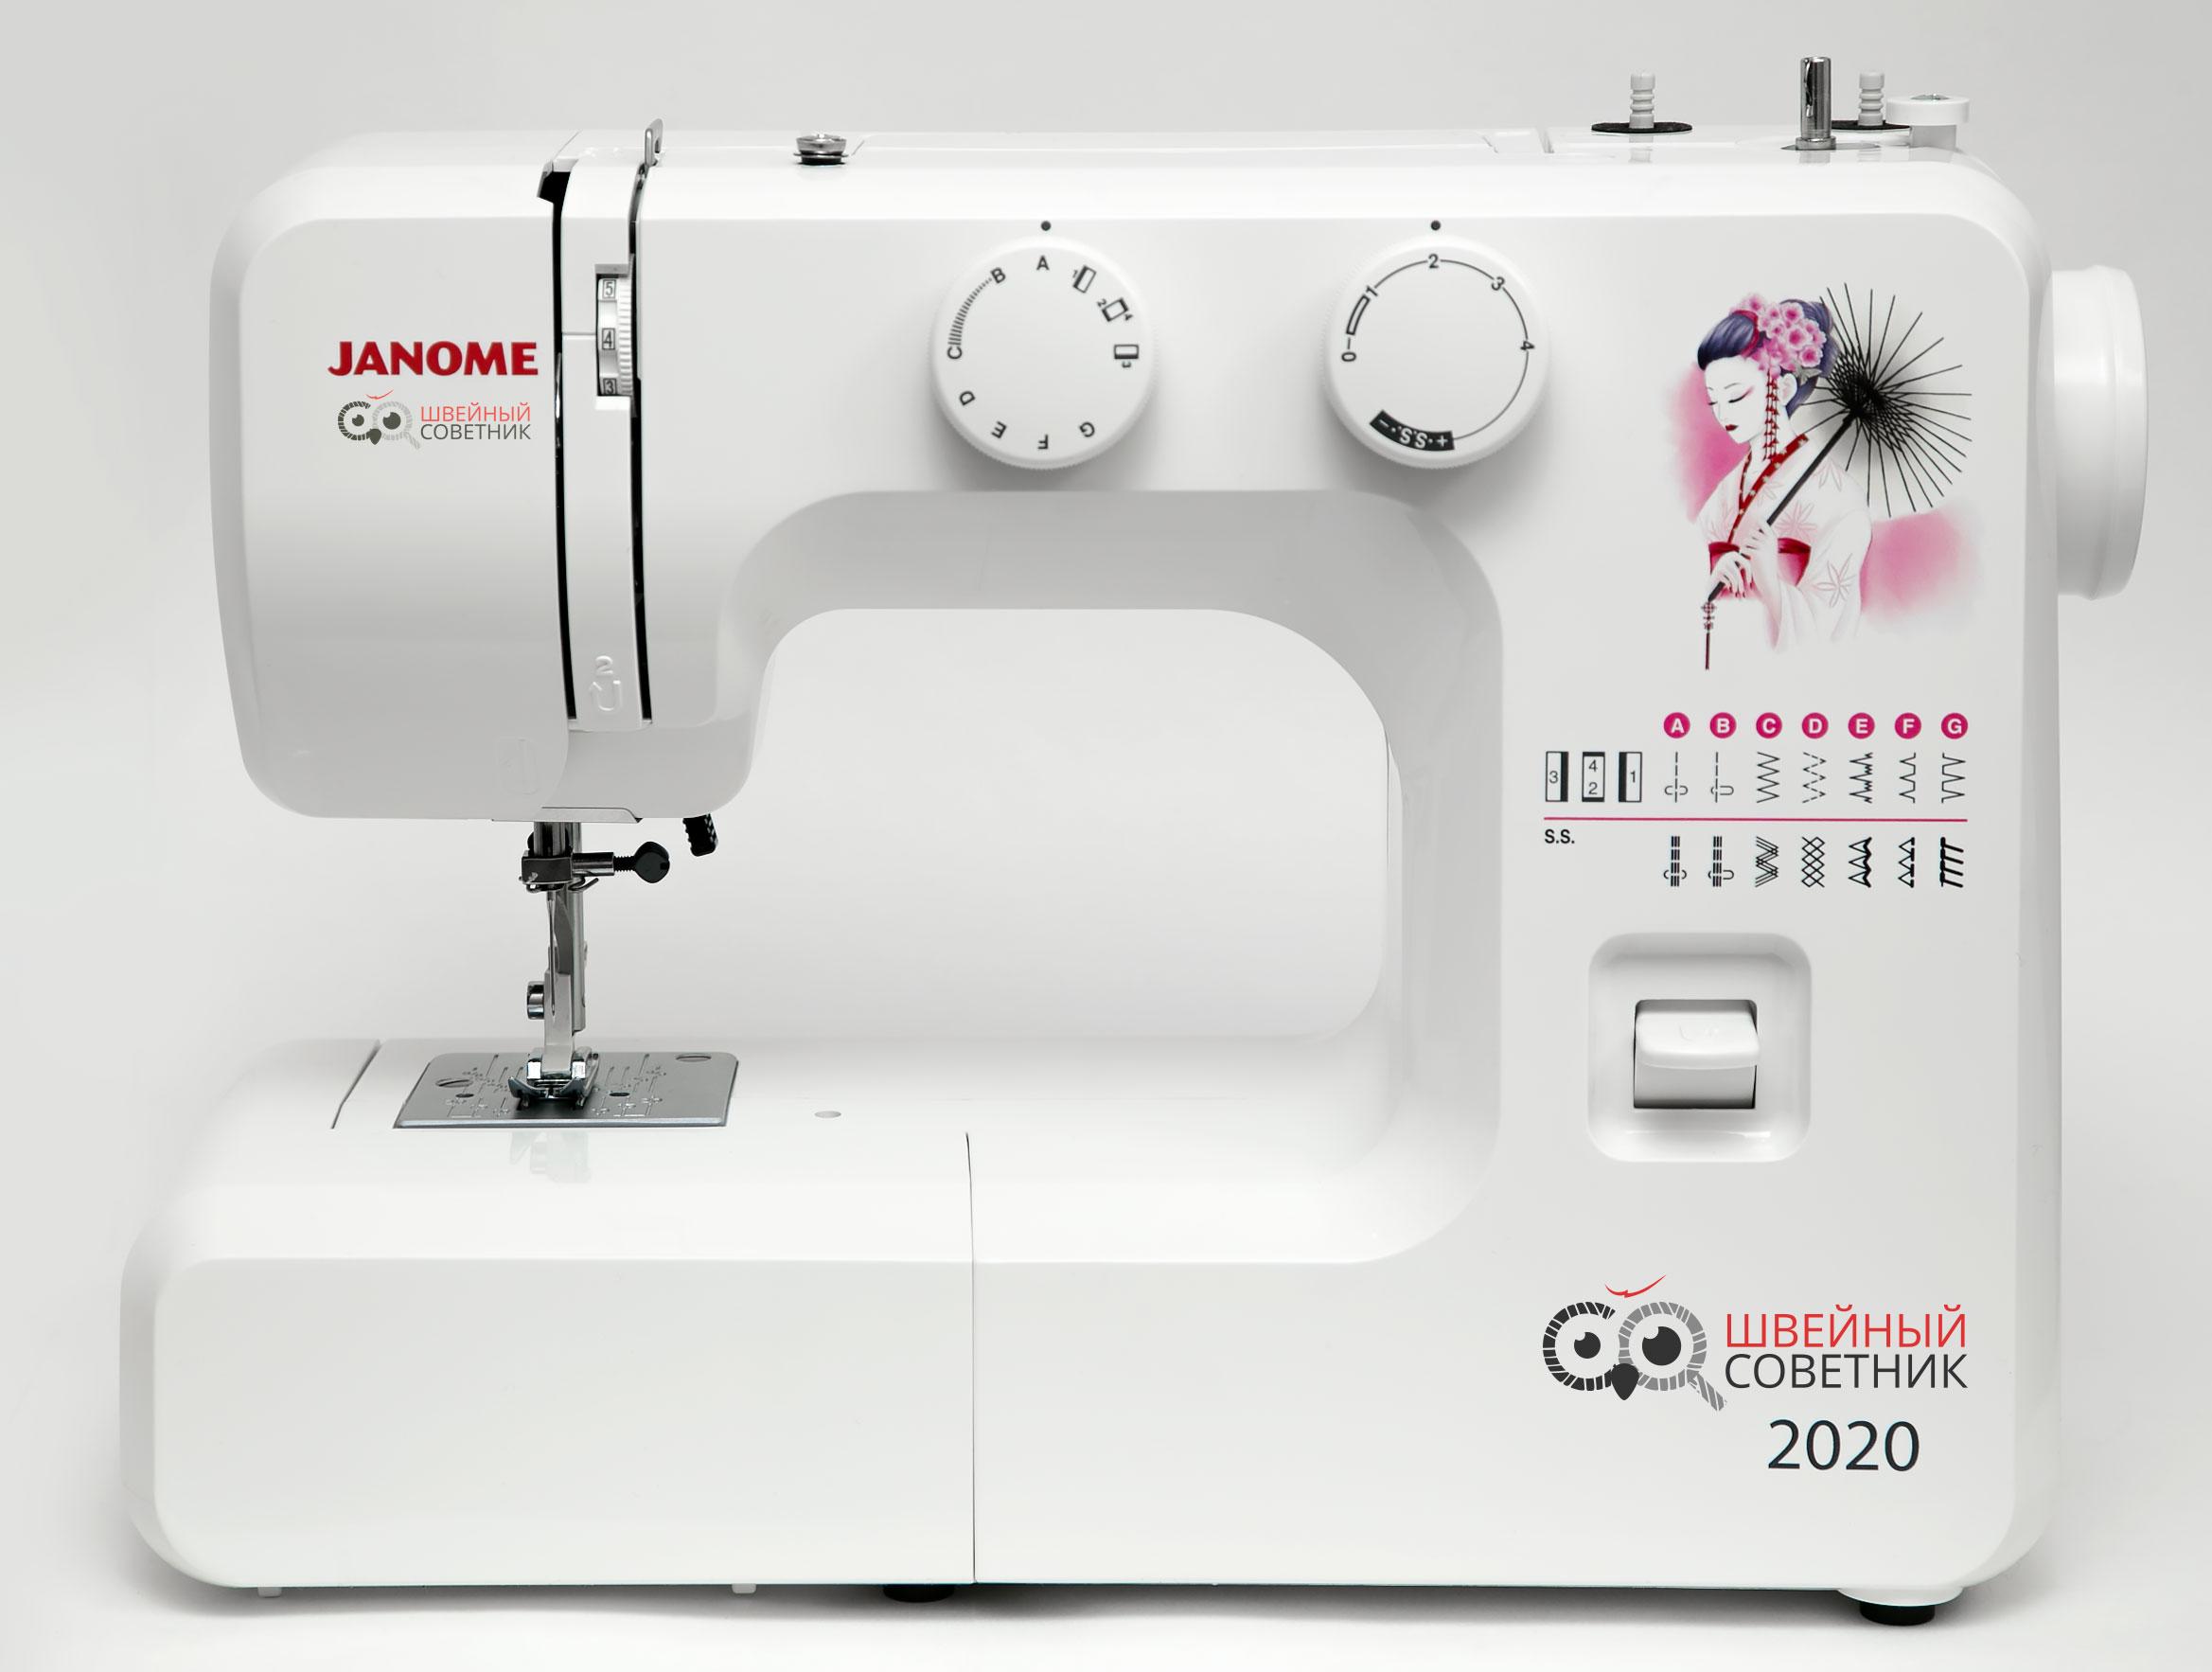 Janome 2020